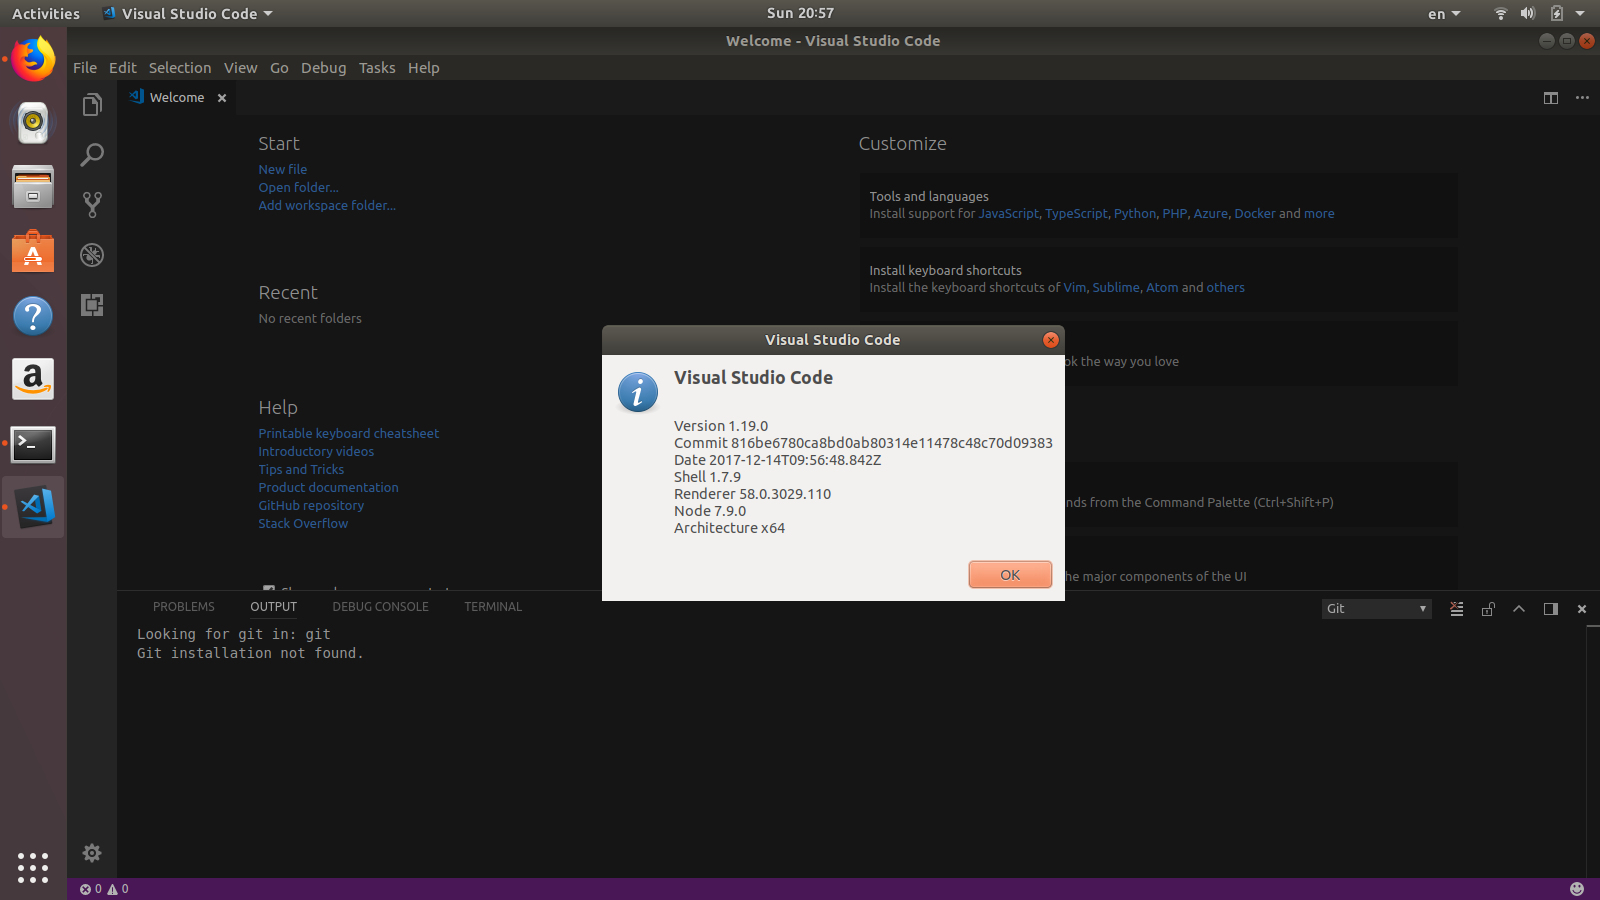 How to install program on Ubuntu: How to install Visual Studio Code